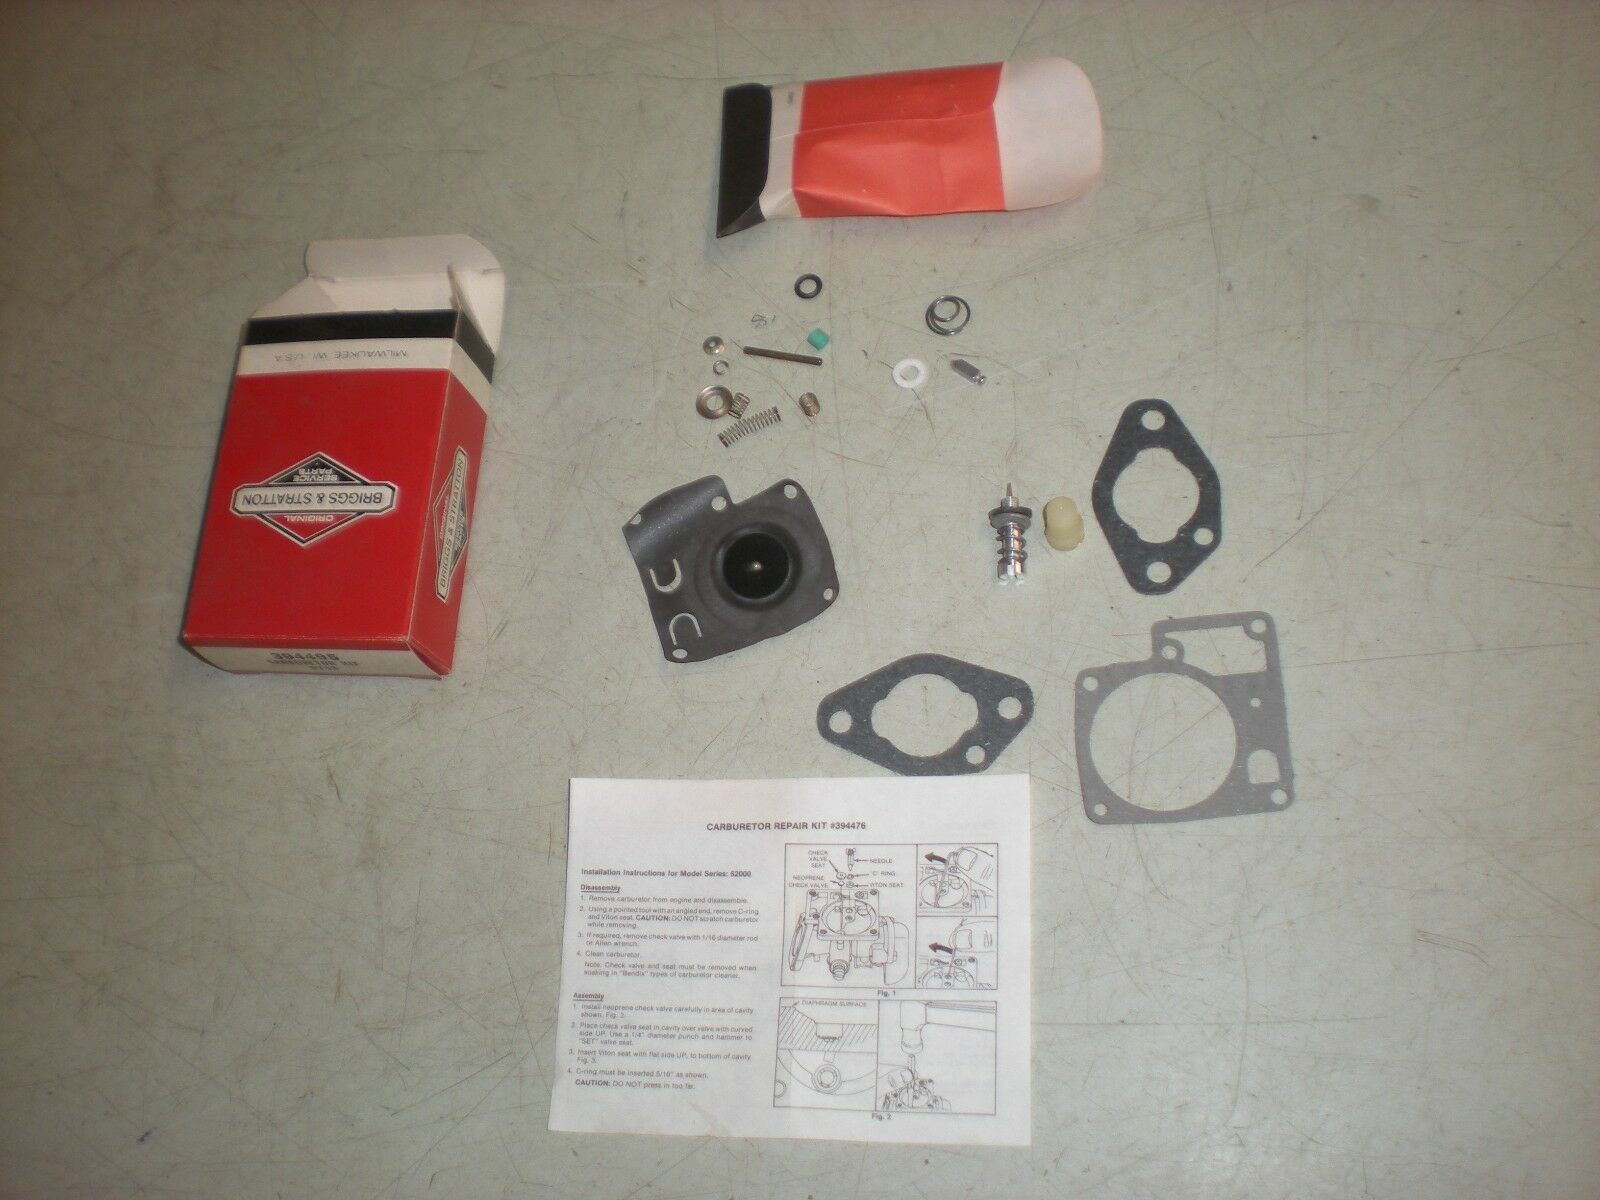 Briggs 394495 Cocheburador Kit Para Motor De NIEVE temprana 62030 Series-nos-nla